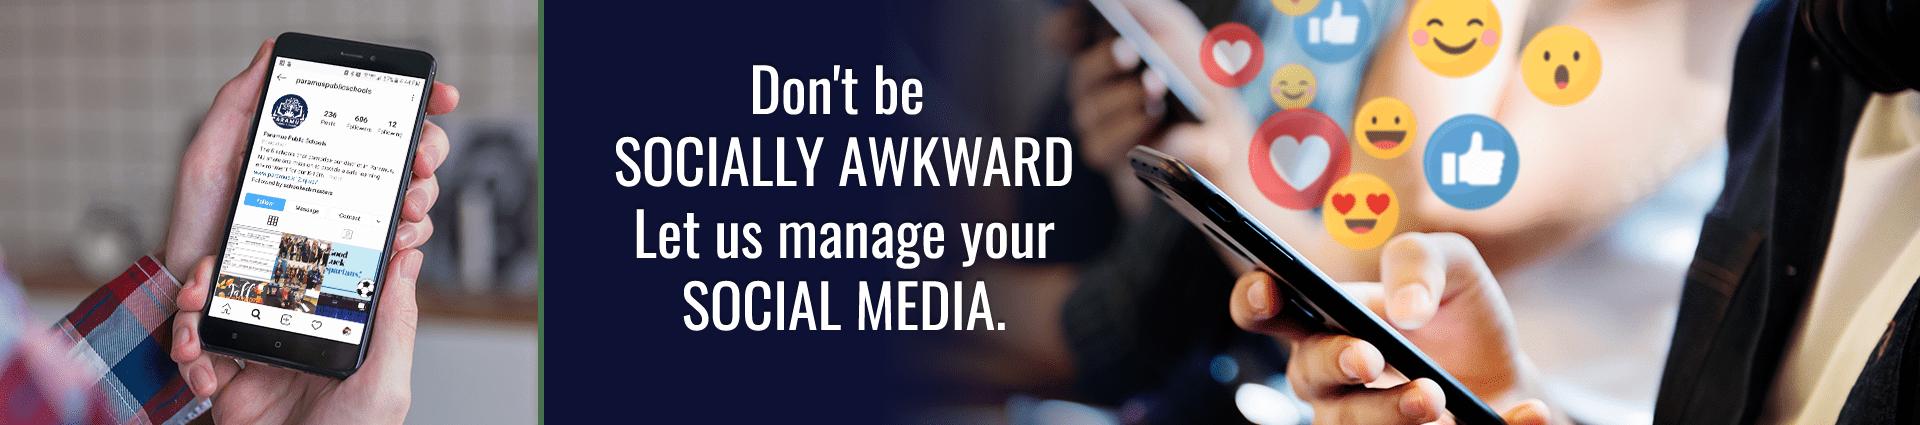 Your school's social media.